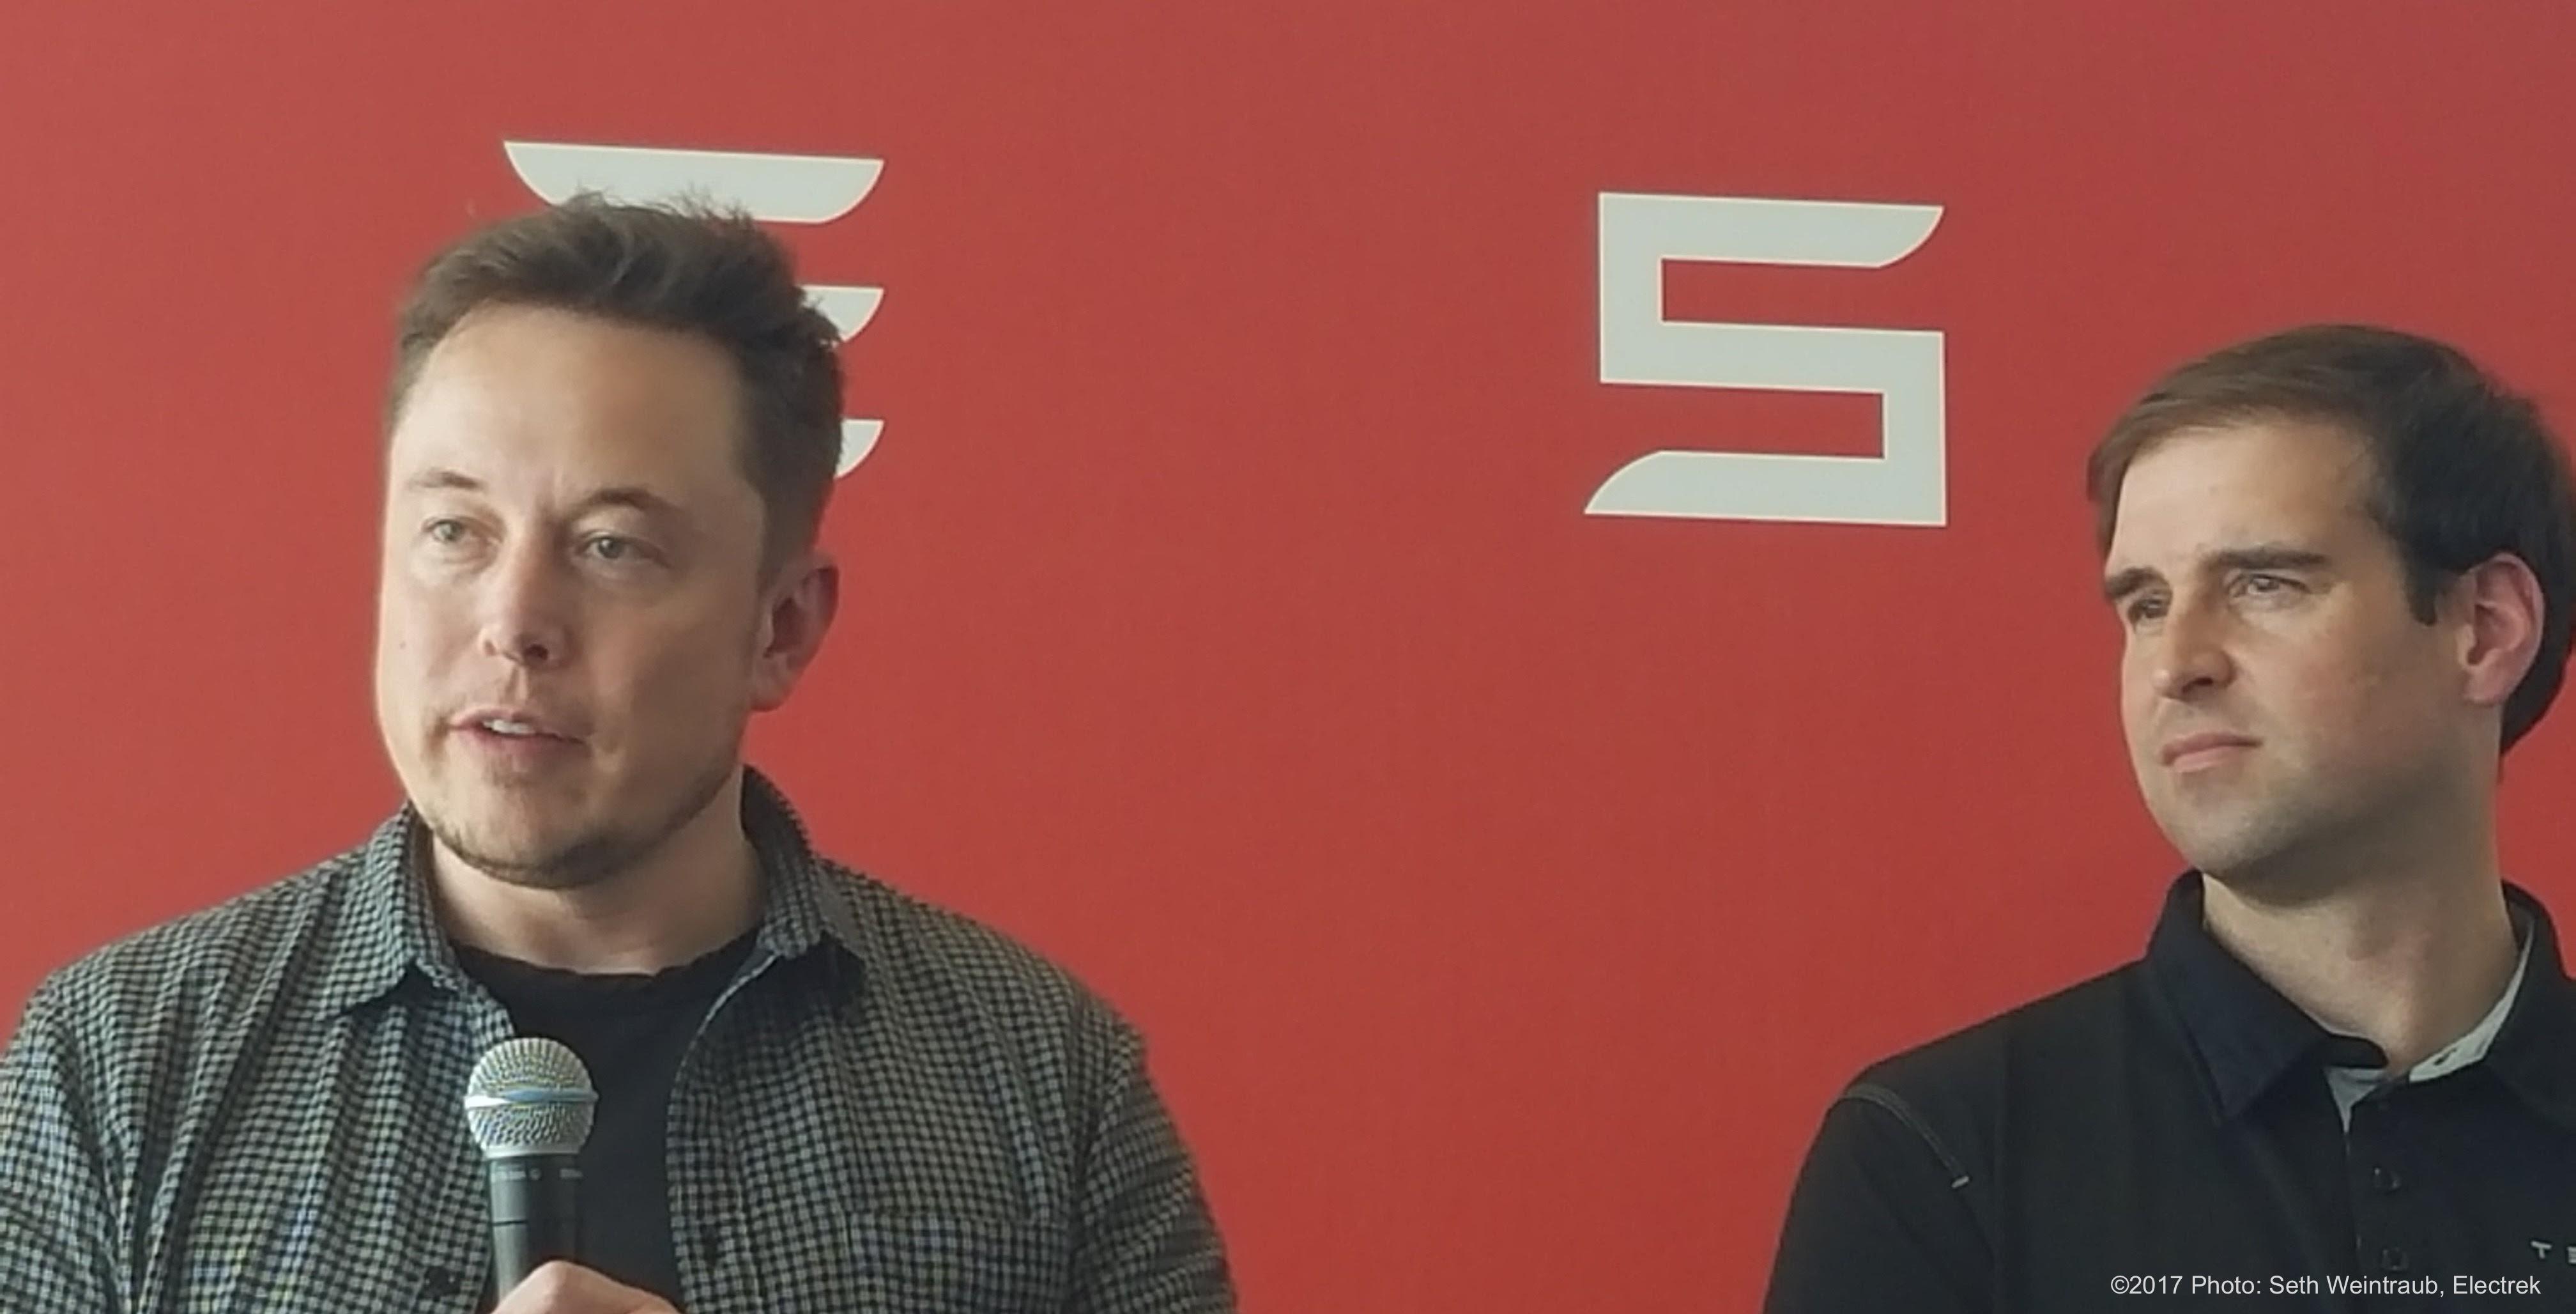 Tesla profit drop in Q4, 7% workforce cut planned after growing 30% last year